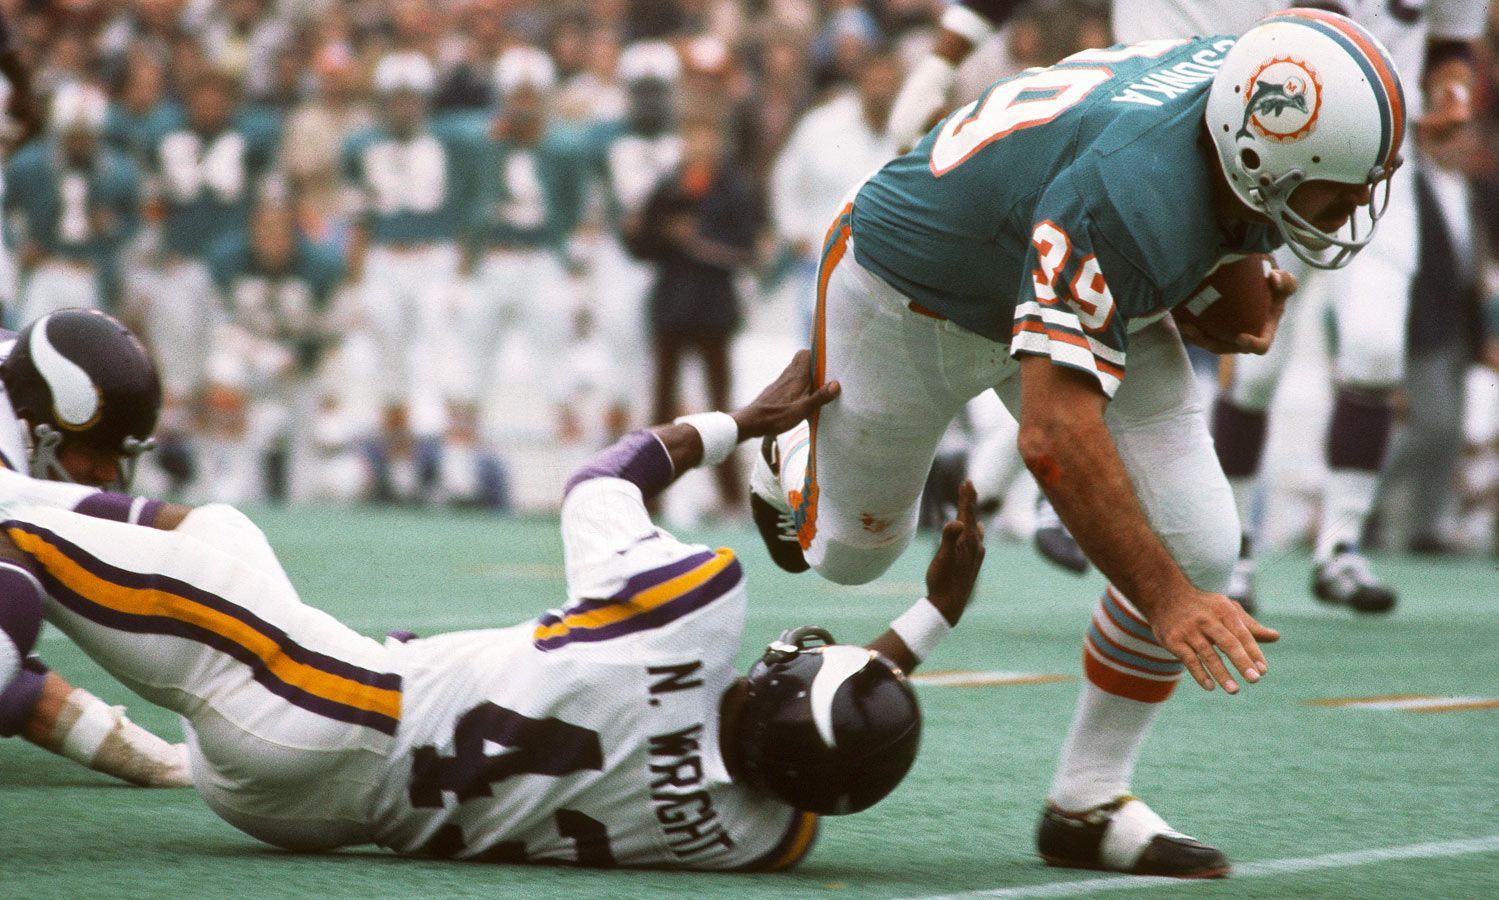 1973 Minnesota Vikings (Super Bowl VIII Miami 24